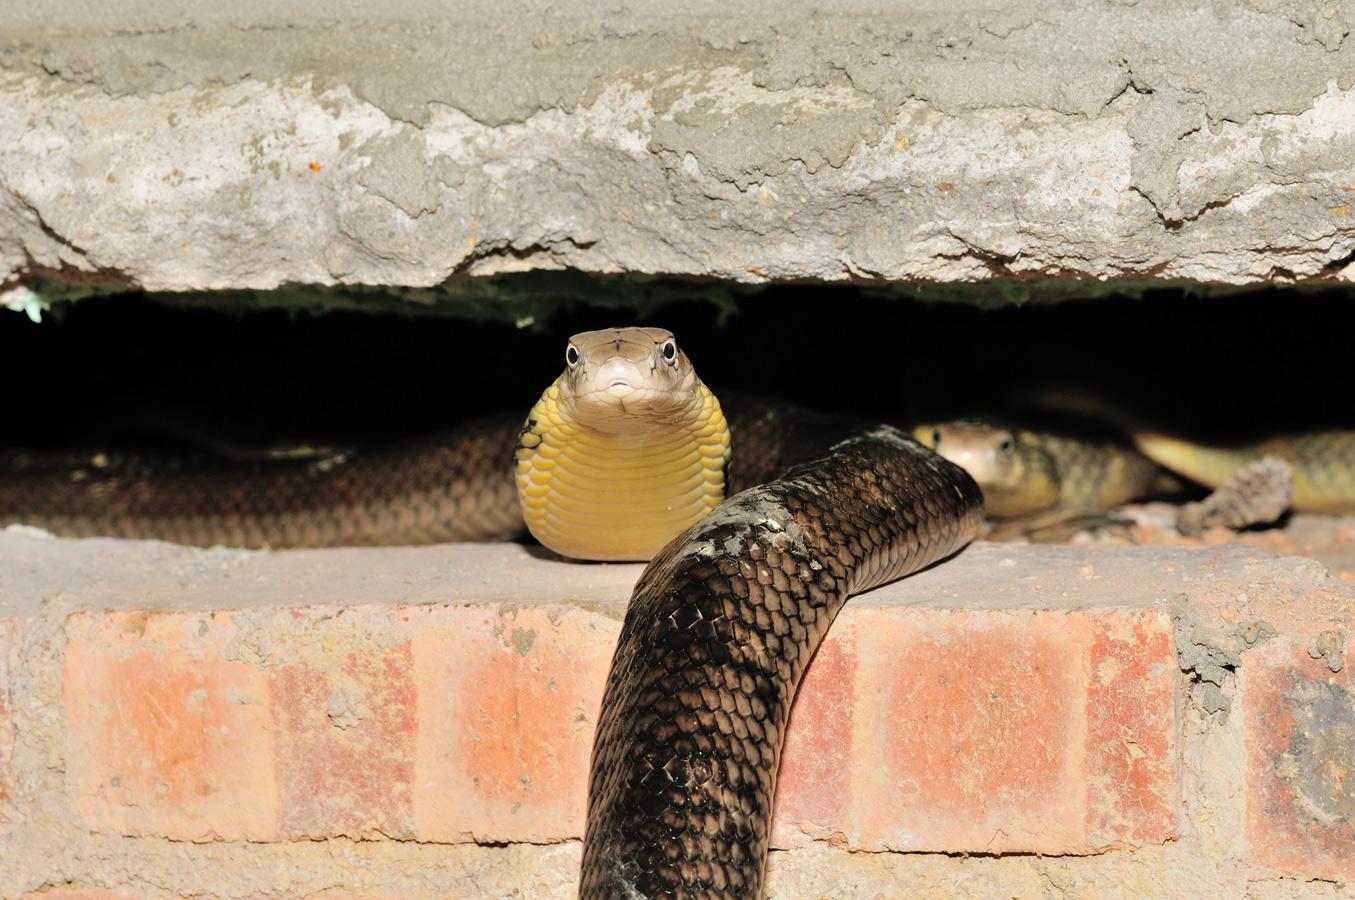 眼鏡王蛇 cobras royaux (Ophiophagus hannah) Guangxi, Chine 2017 ©AYMERICH Michel